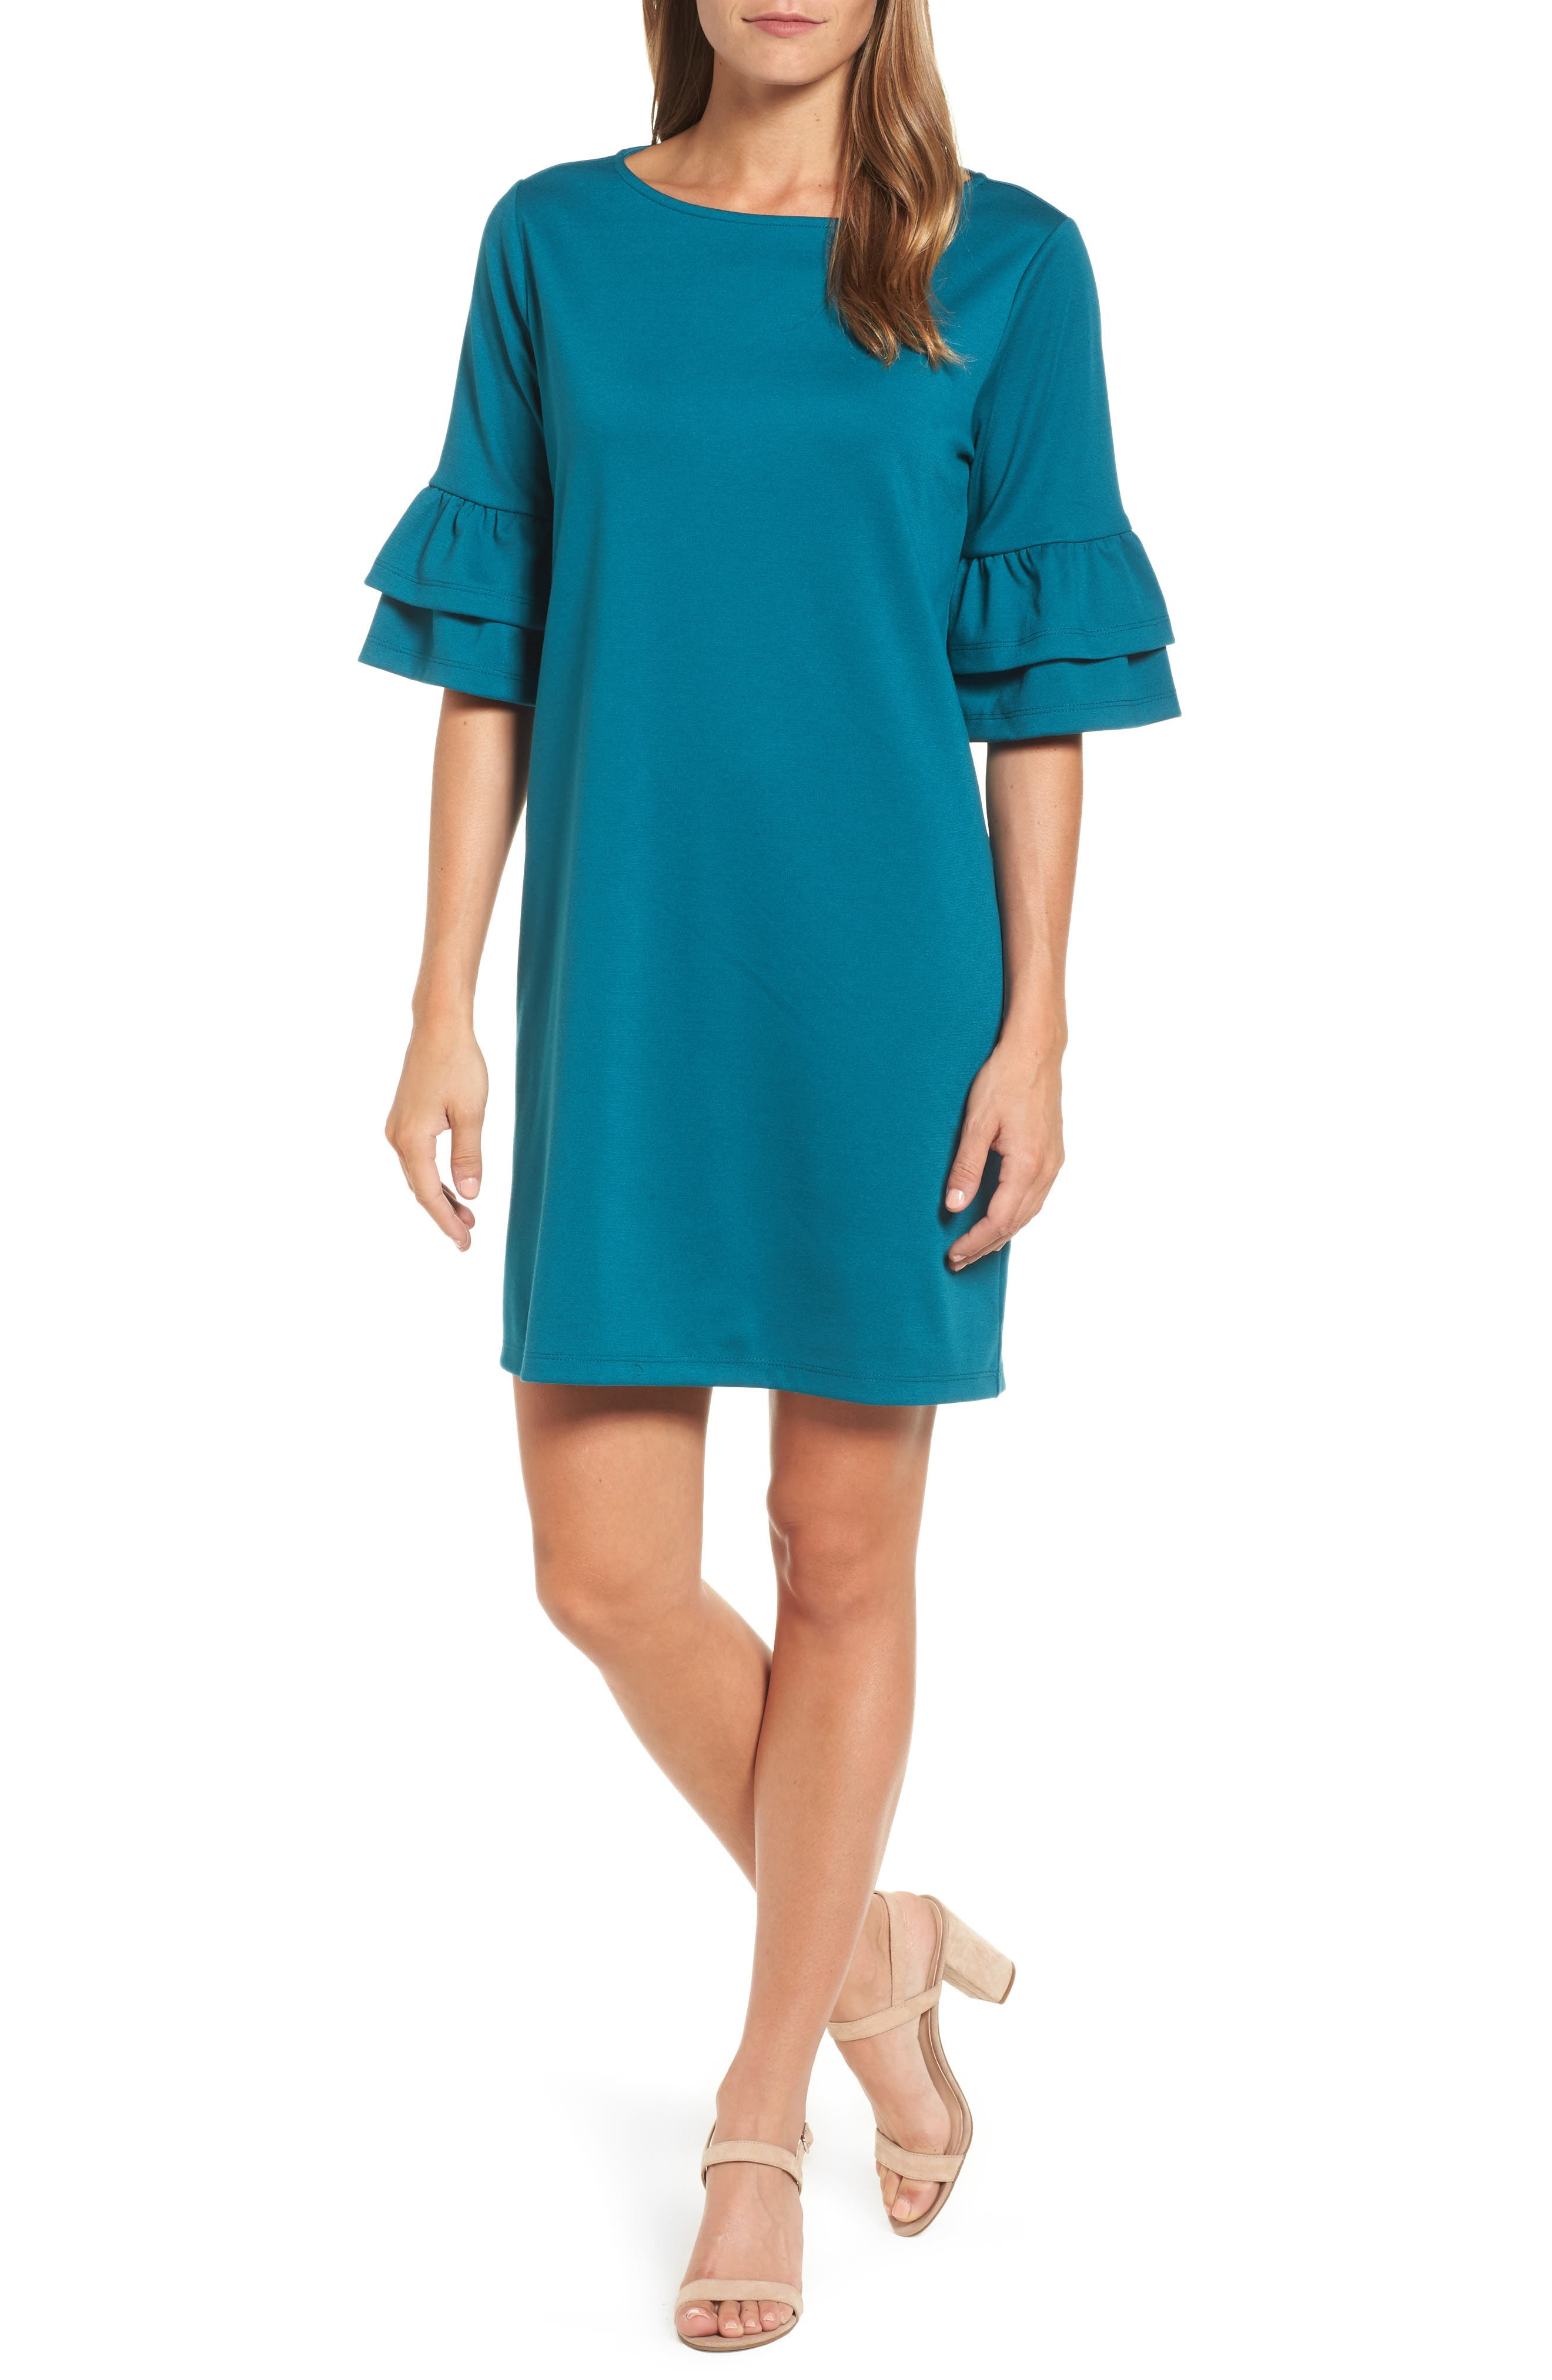 Ruffle Sleeve Shift Dress,                         Main,                         color, Teal